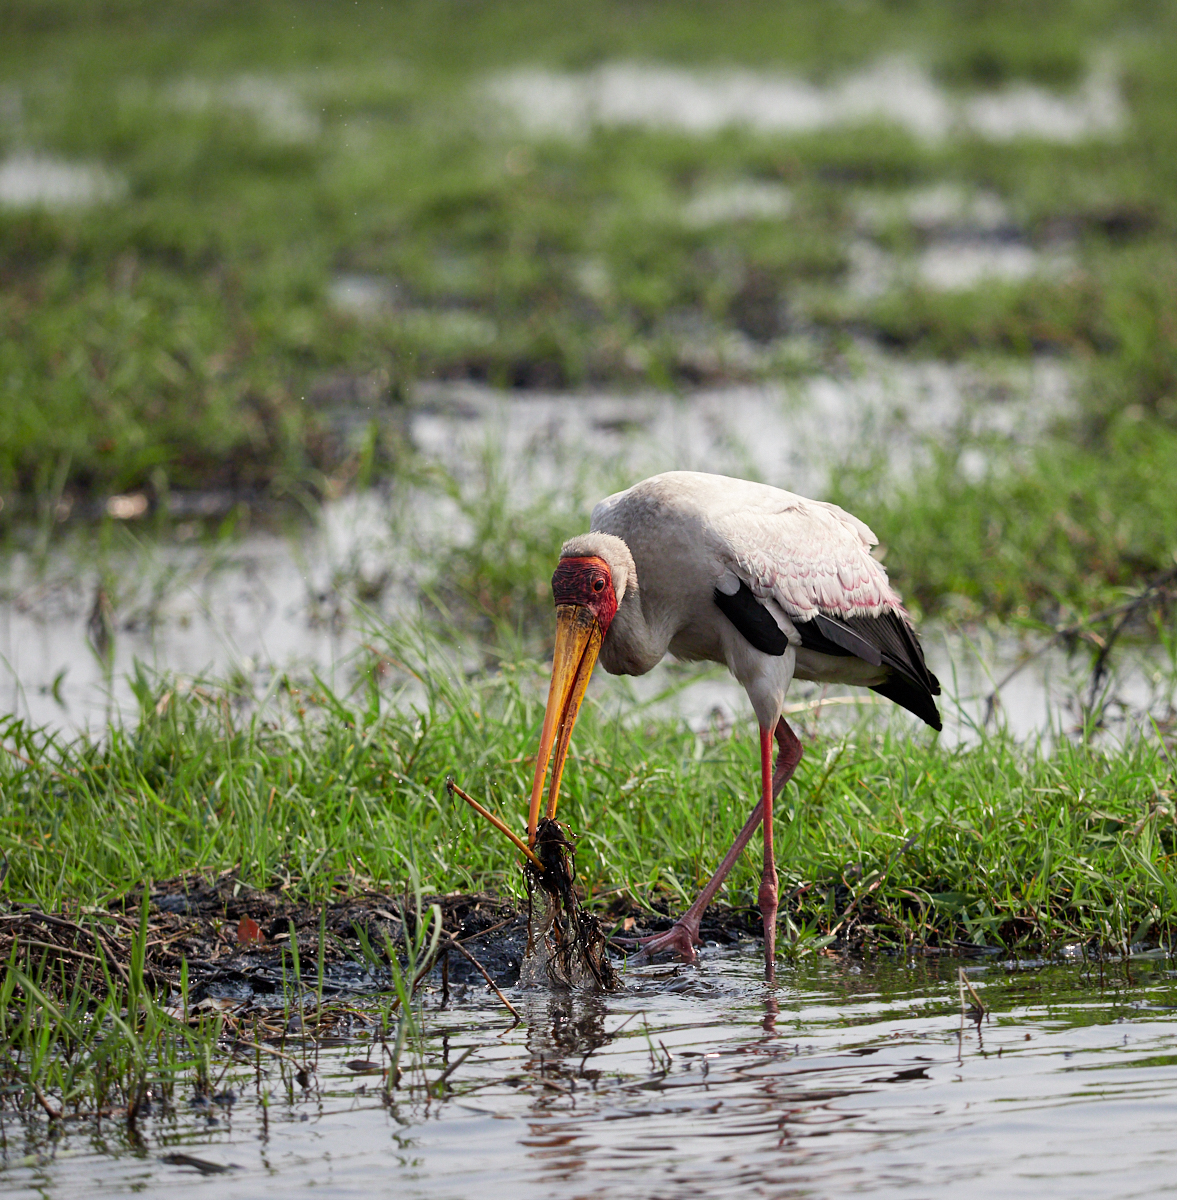 Yellow-billed stork fishing 1600x1200 sRGB.jpg